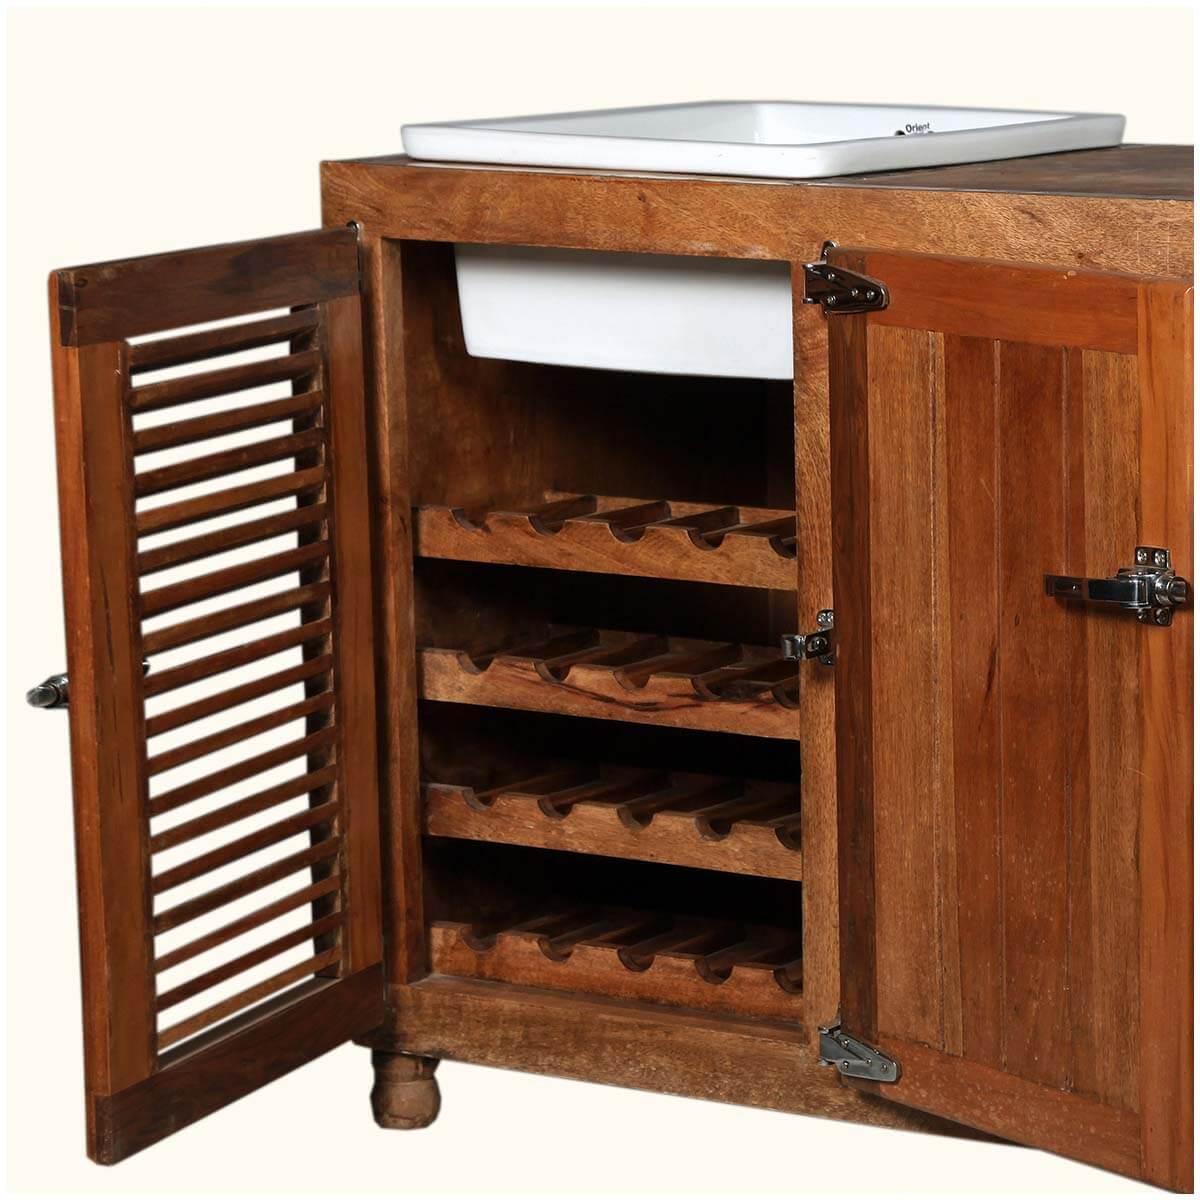 Mission Solid Wood Ceramic Wine Rack Kitchen Sink Cabinet